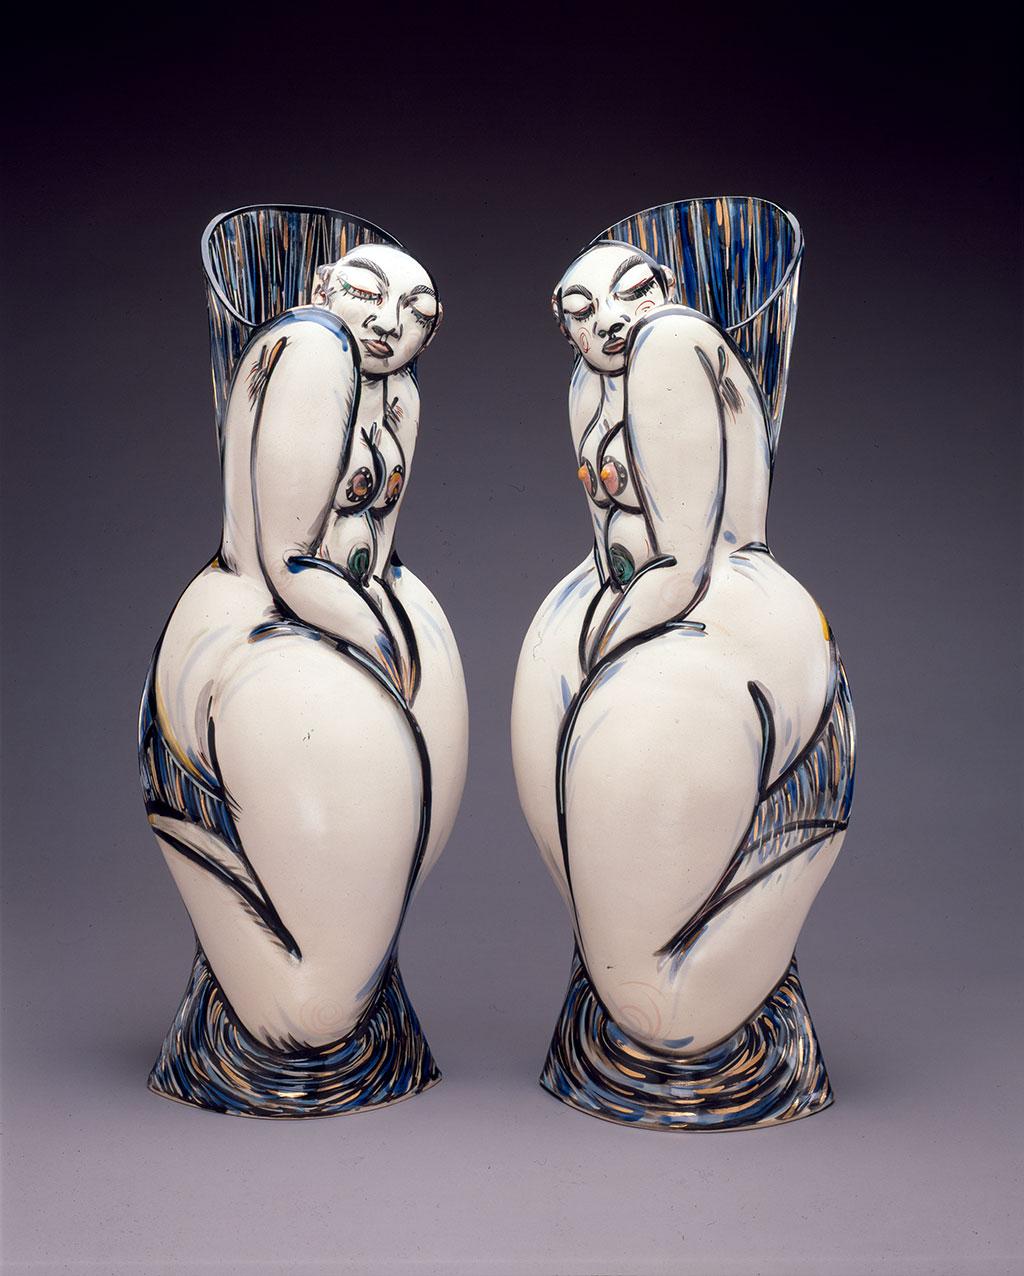 Akio Takamori, Gemini Vases